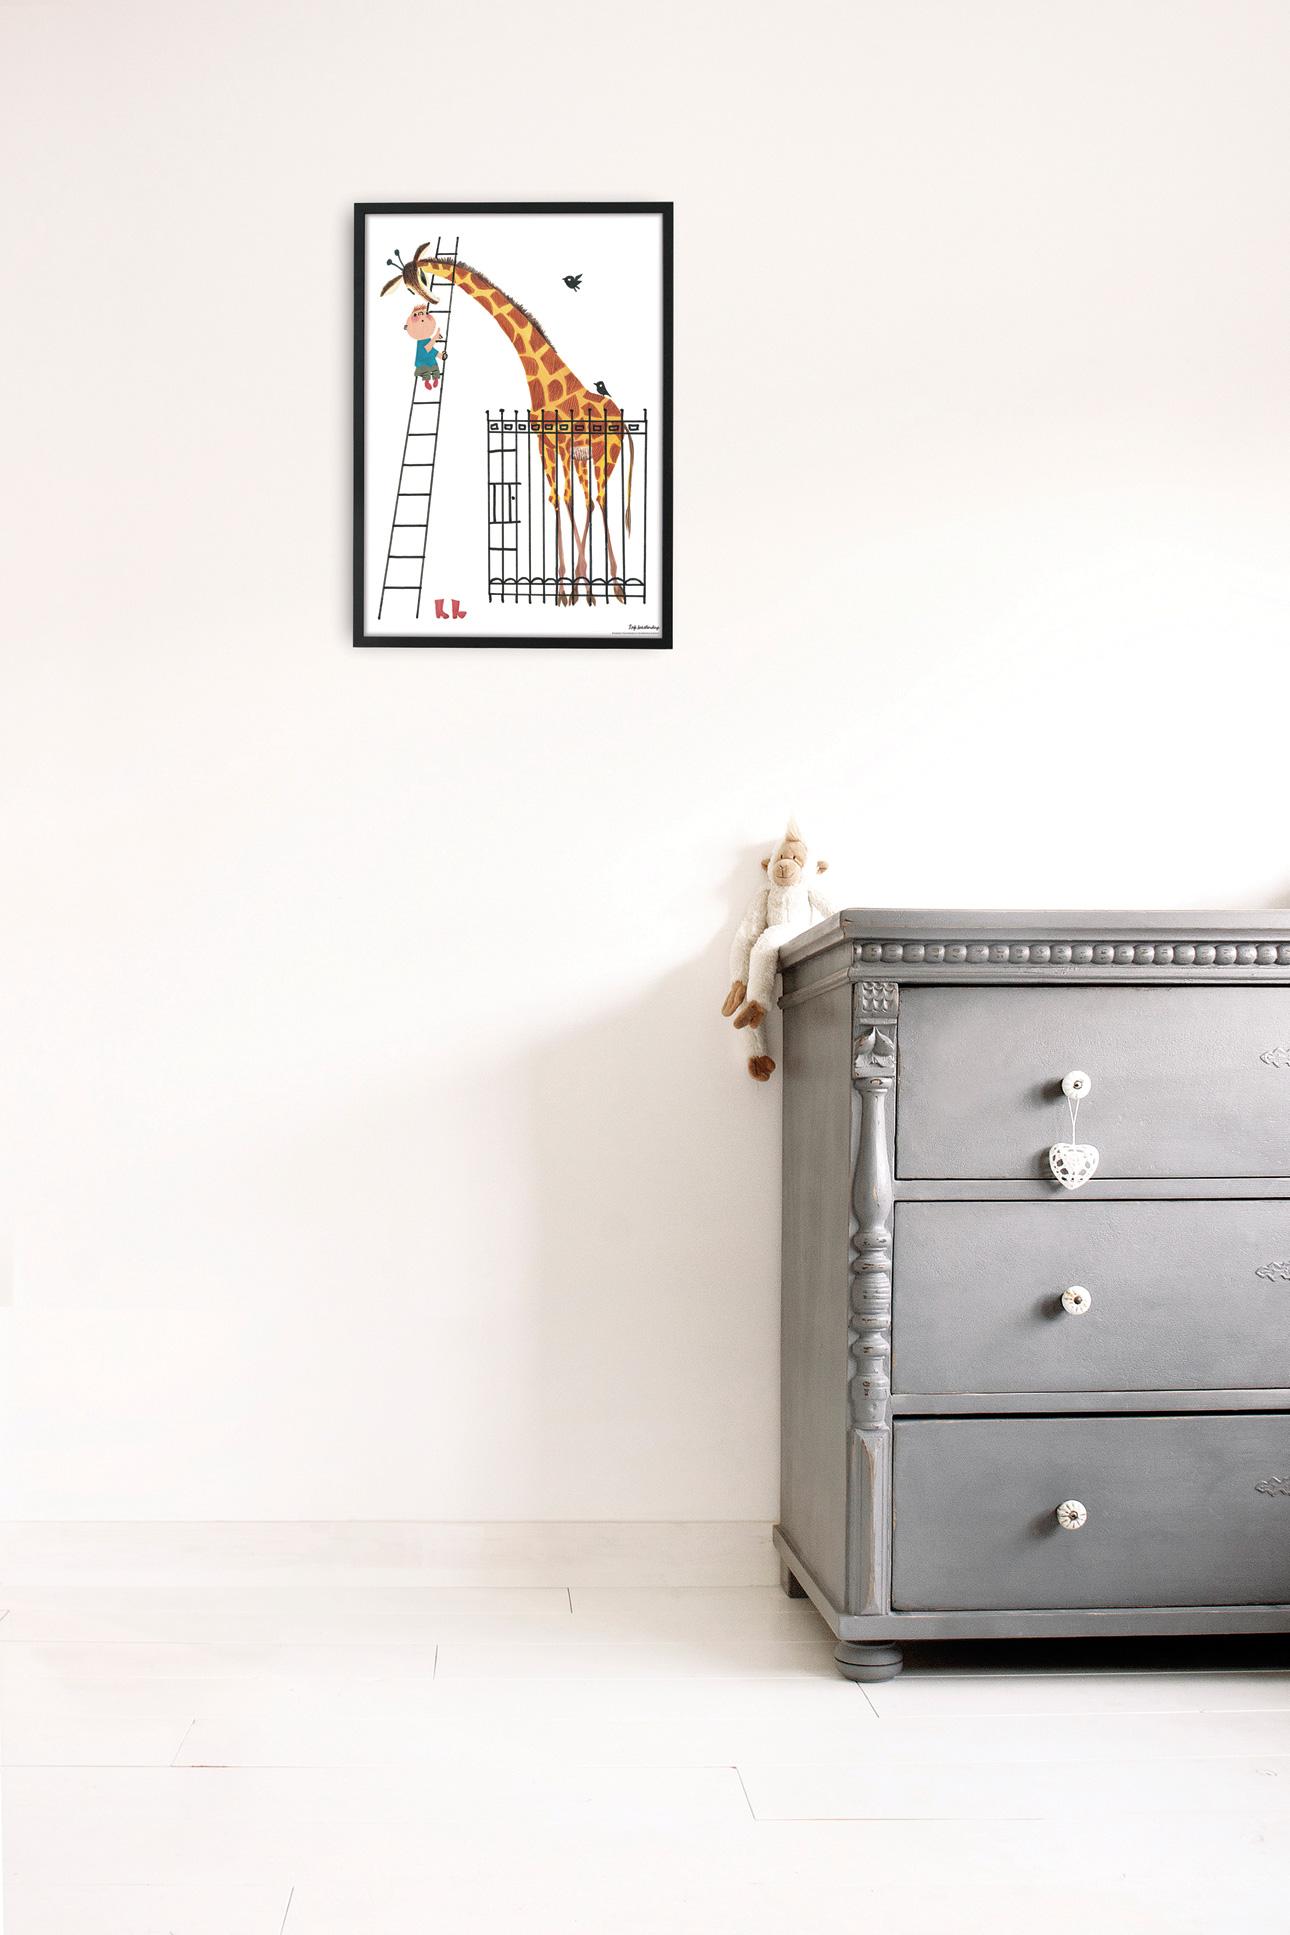 Kek Amsterdam poster fiep giraffe